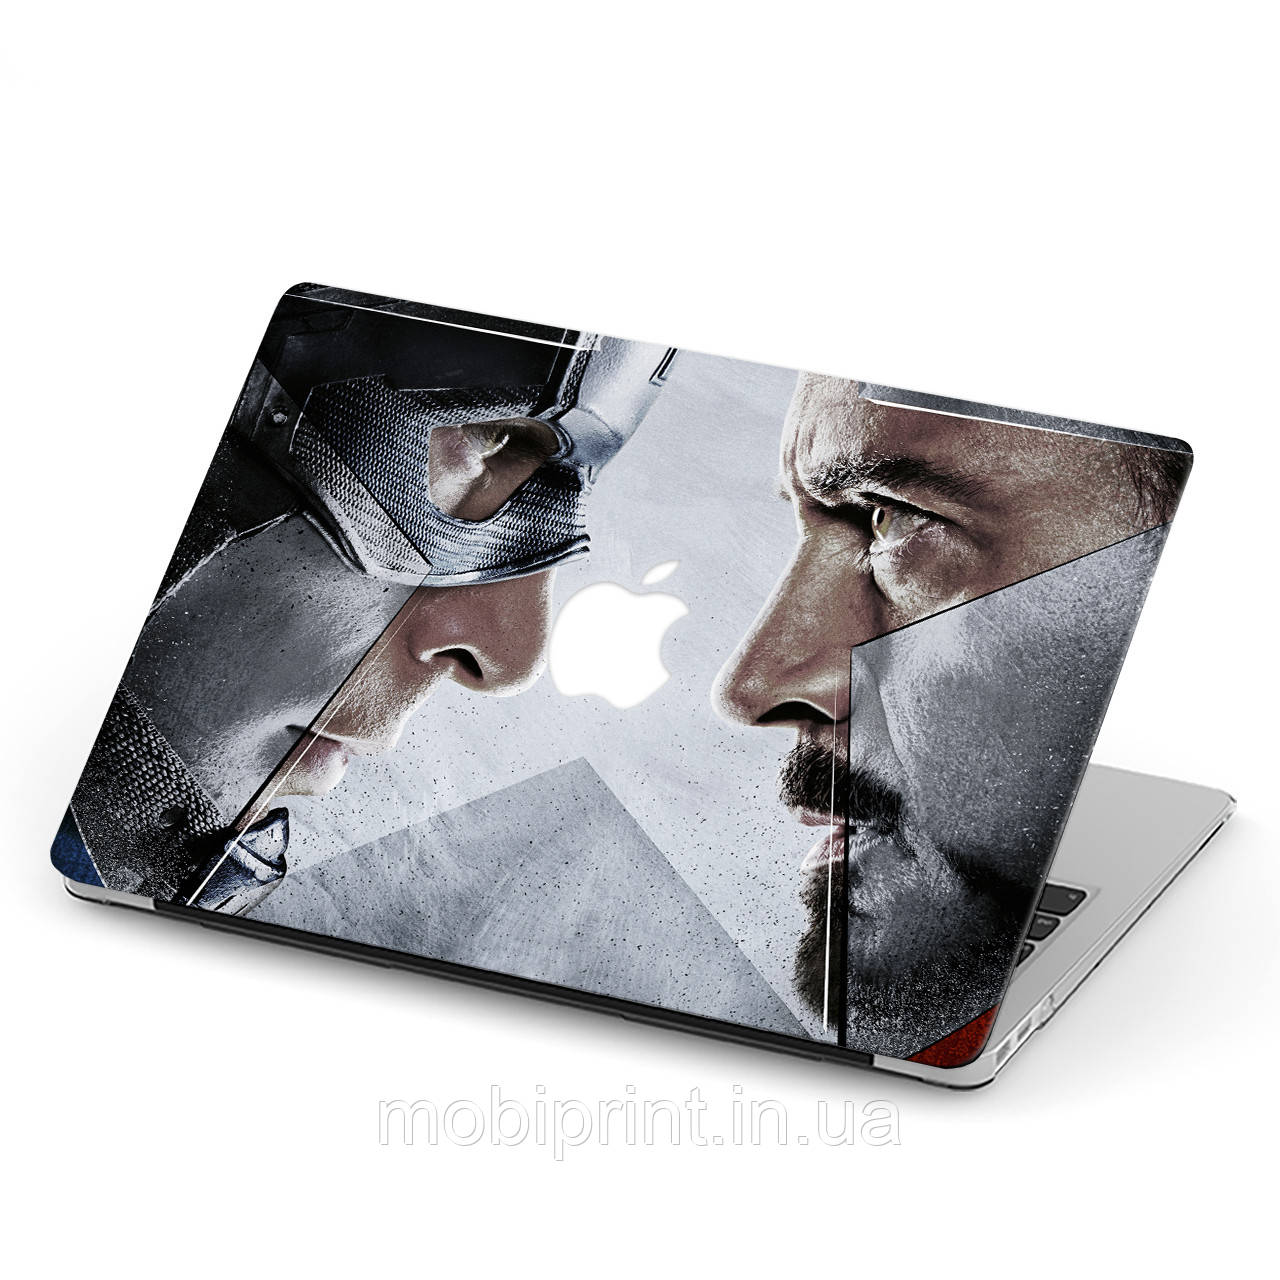 Чехол пластиковый для Apple MacBook Pro / Air Марвел (Marvel) макбук про case hard cover